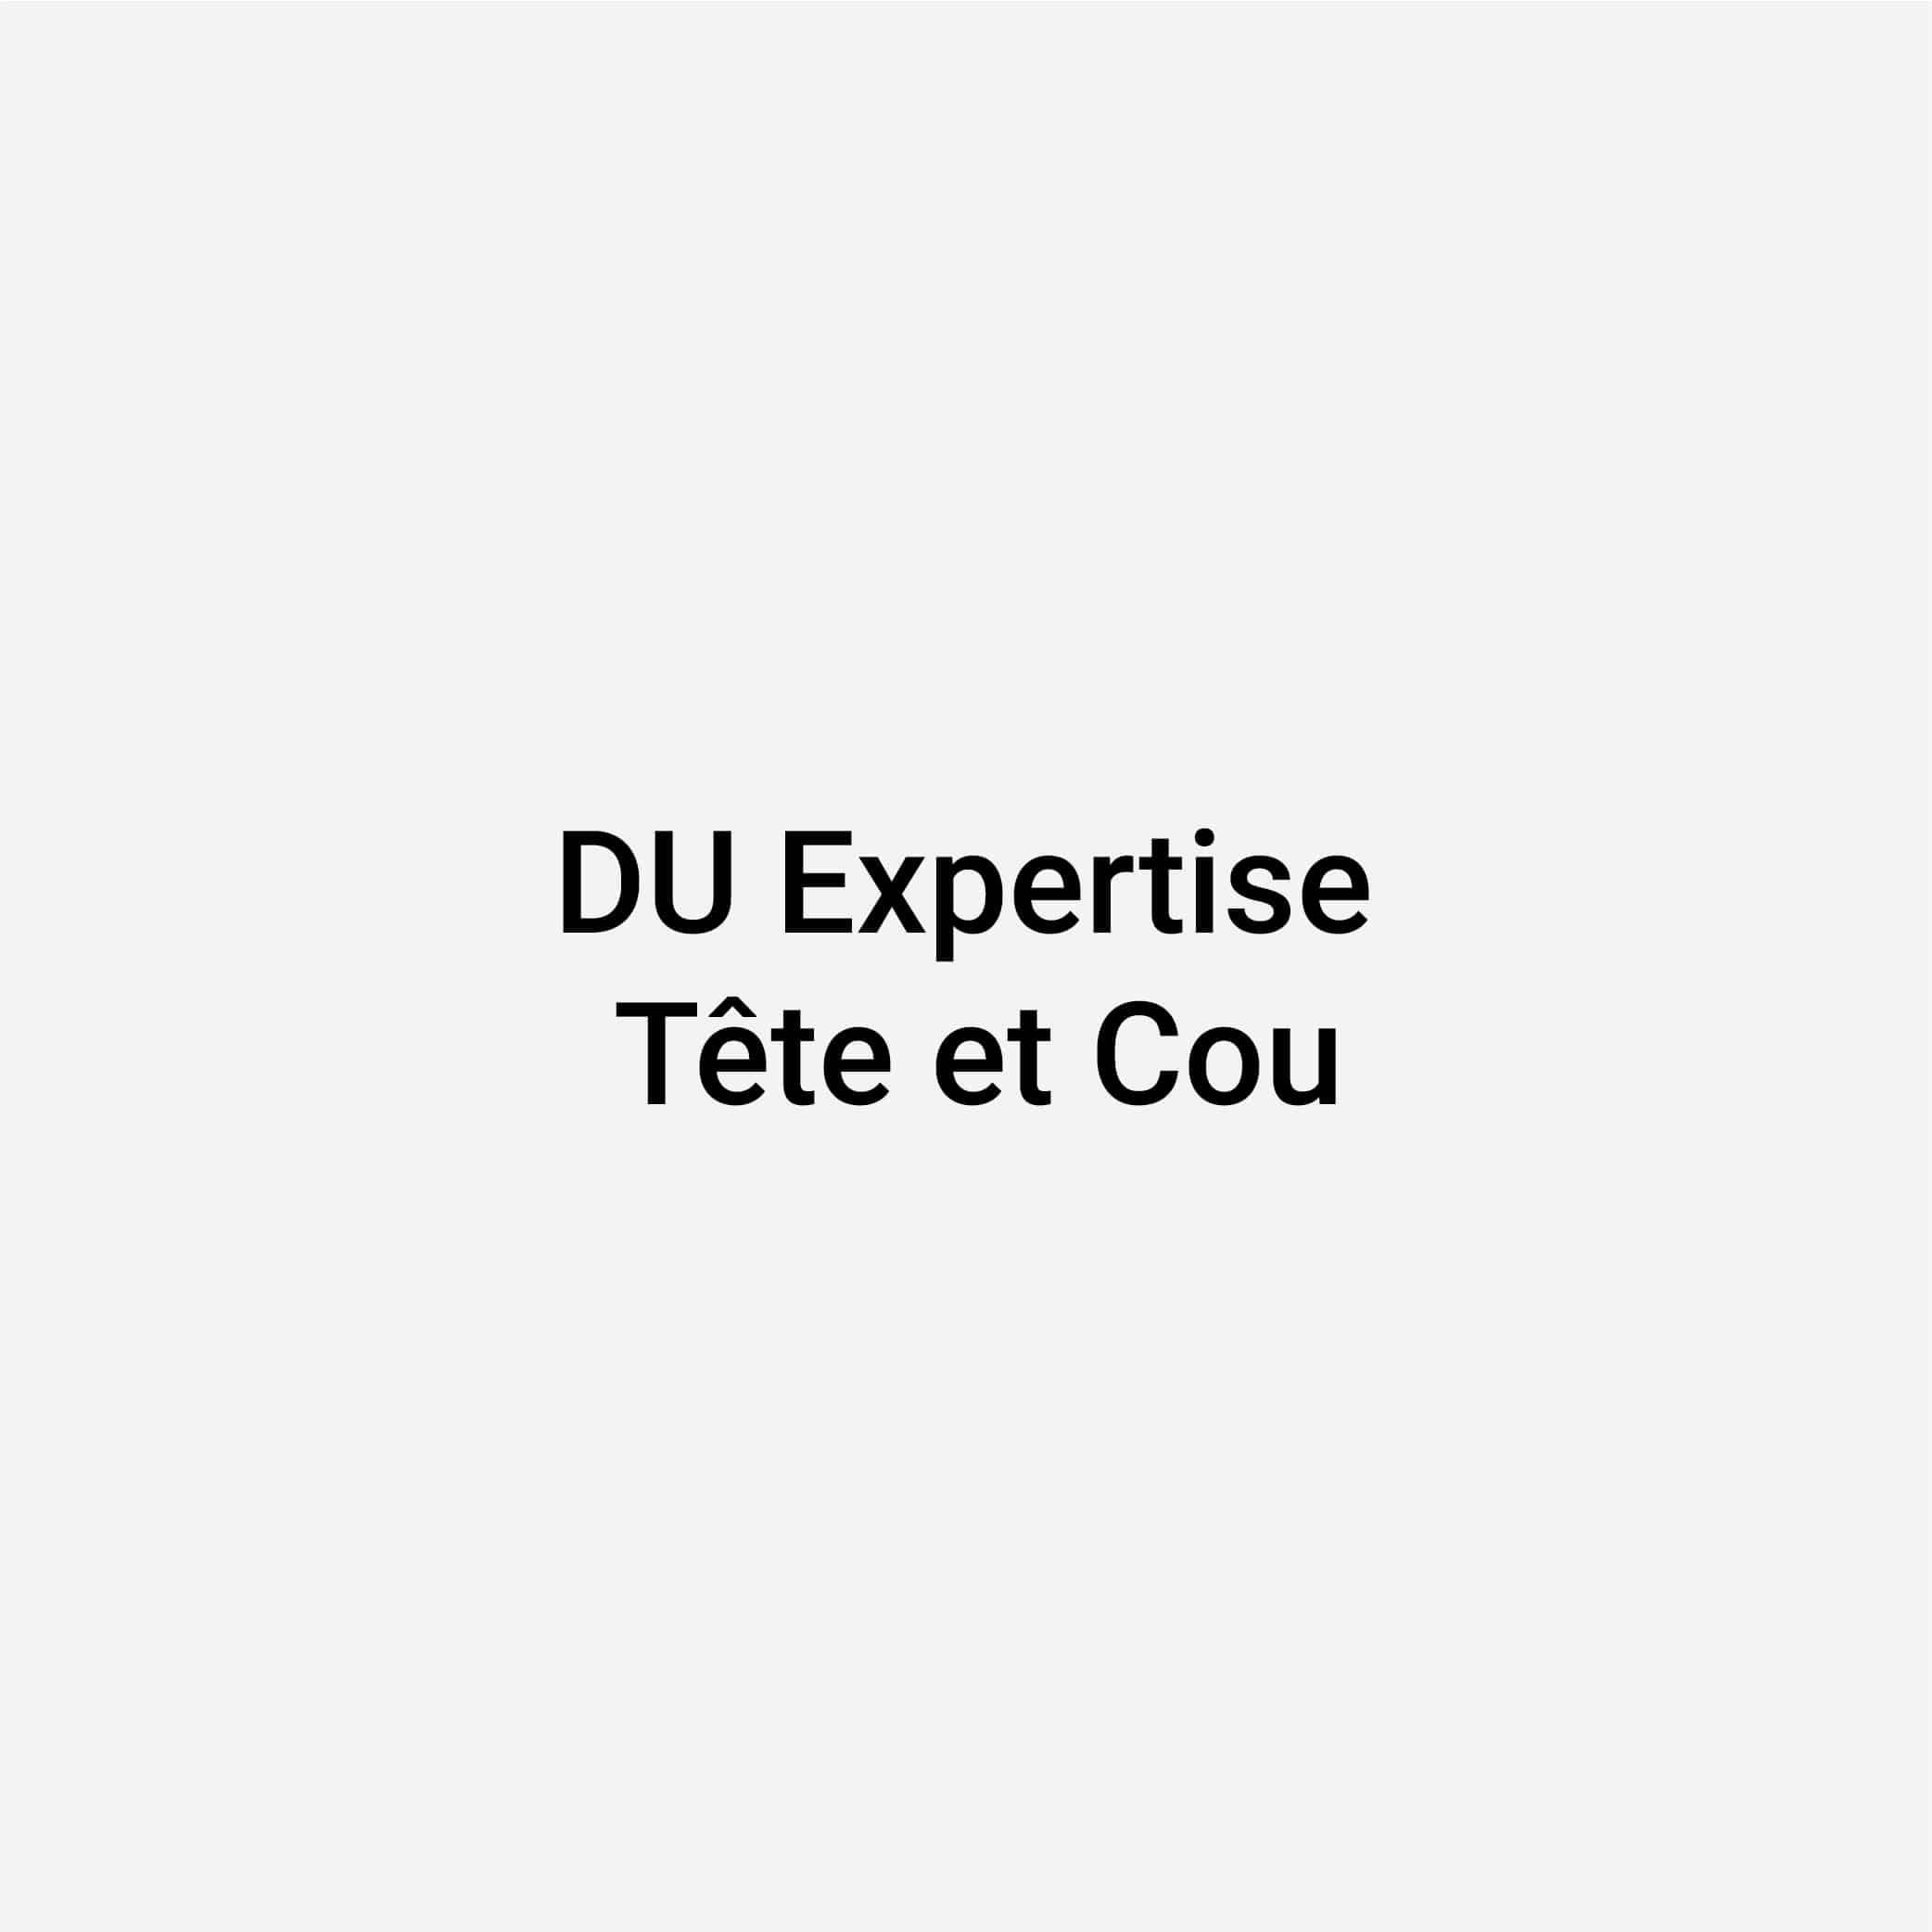 DU Expertise Tête et Cou